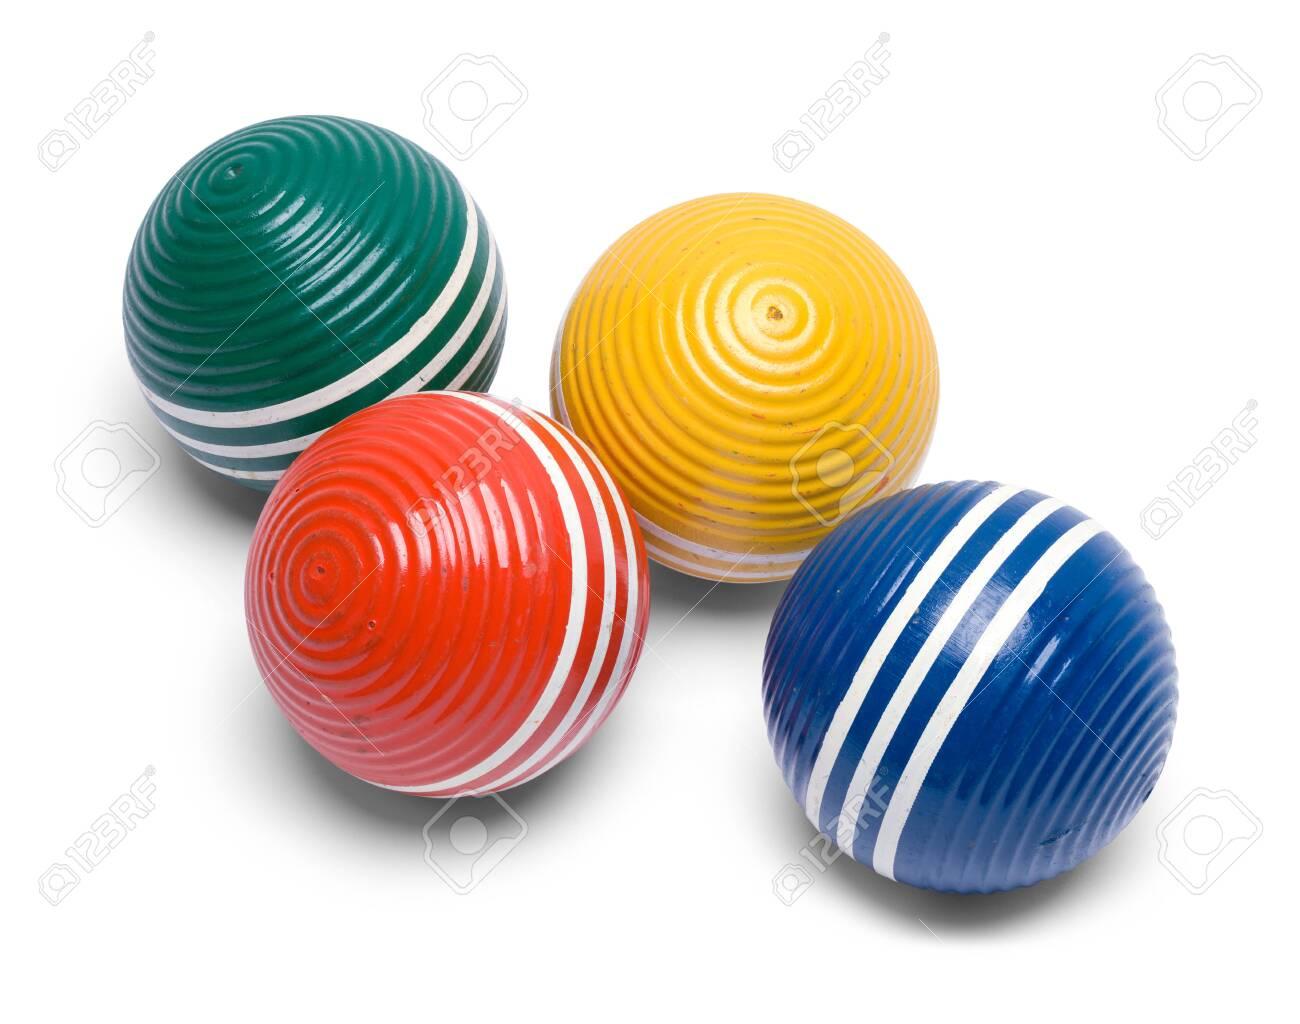 Four Croquet Balls Isolated On White Background Stock Photo 1300x1024